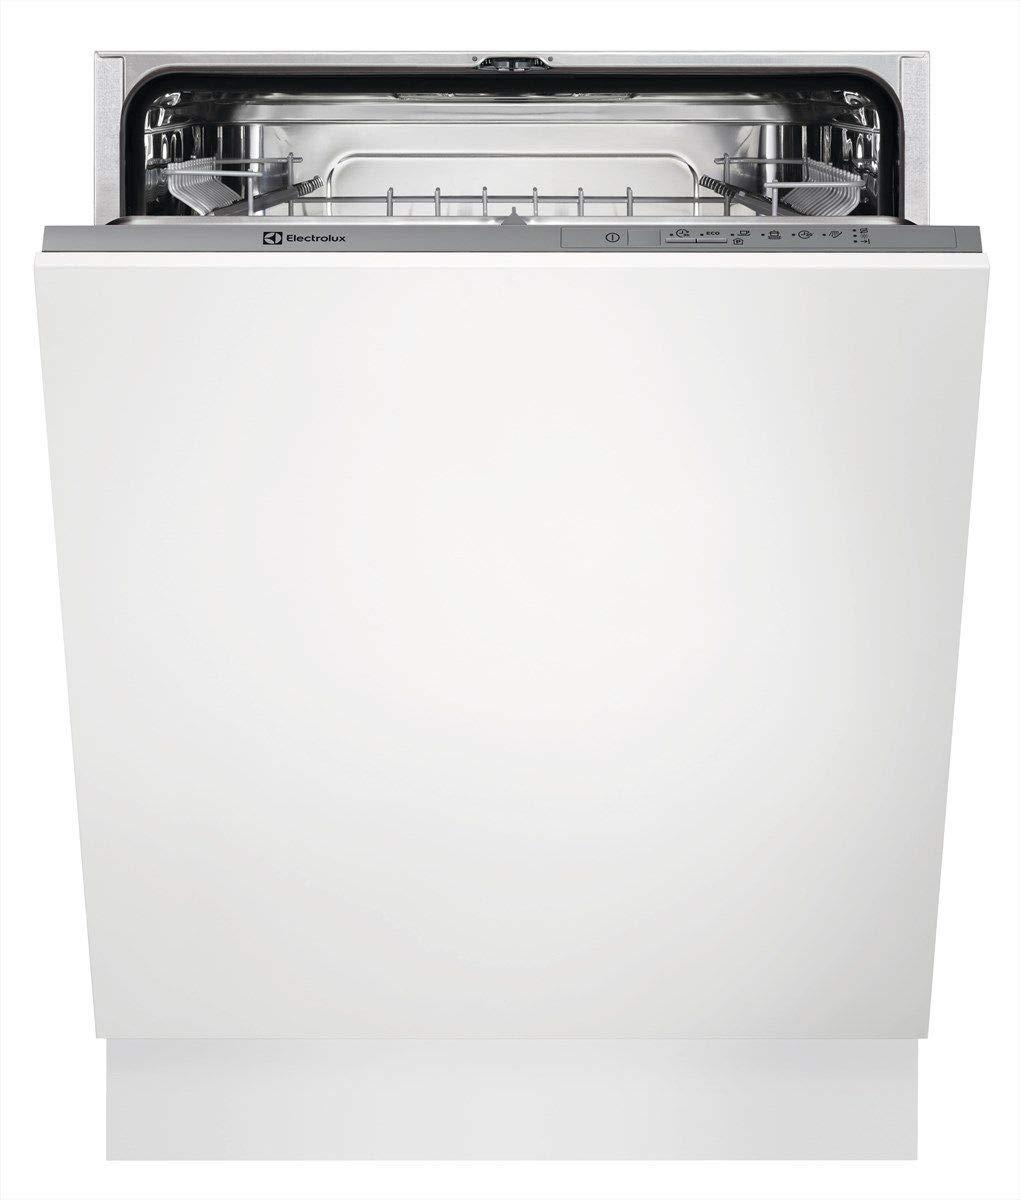 LVS 13C. 5 PROG. A+ AIR DR: Amazon.es: Grandes electrodomésticos